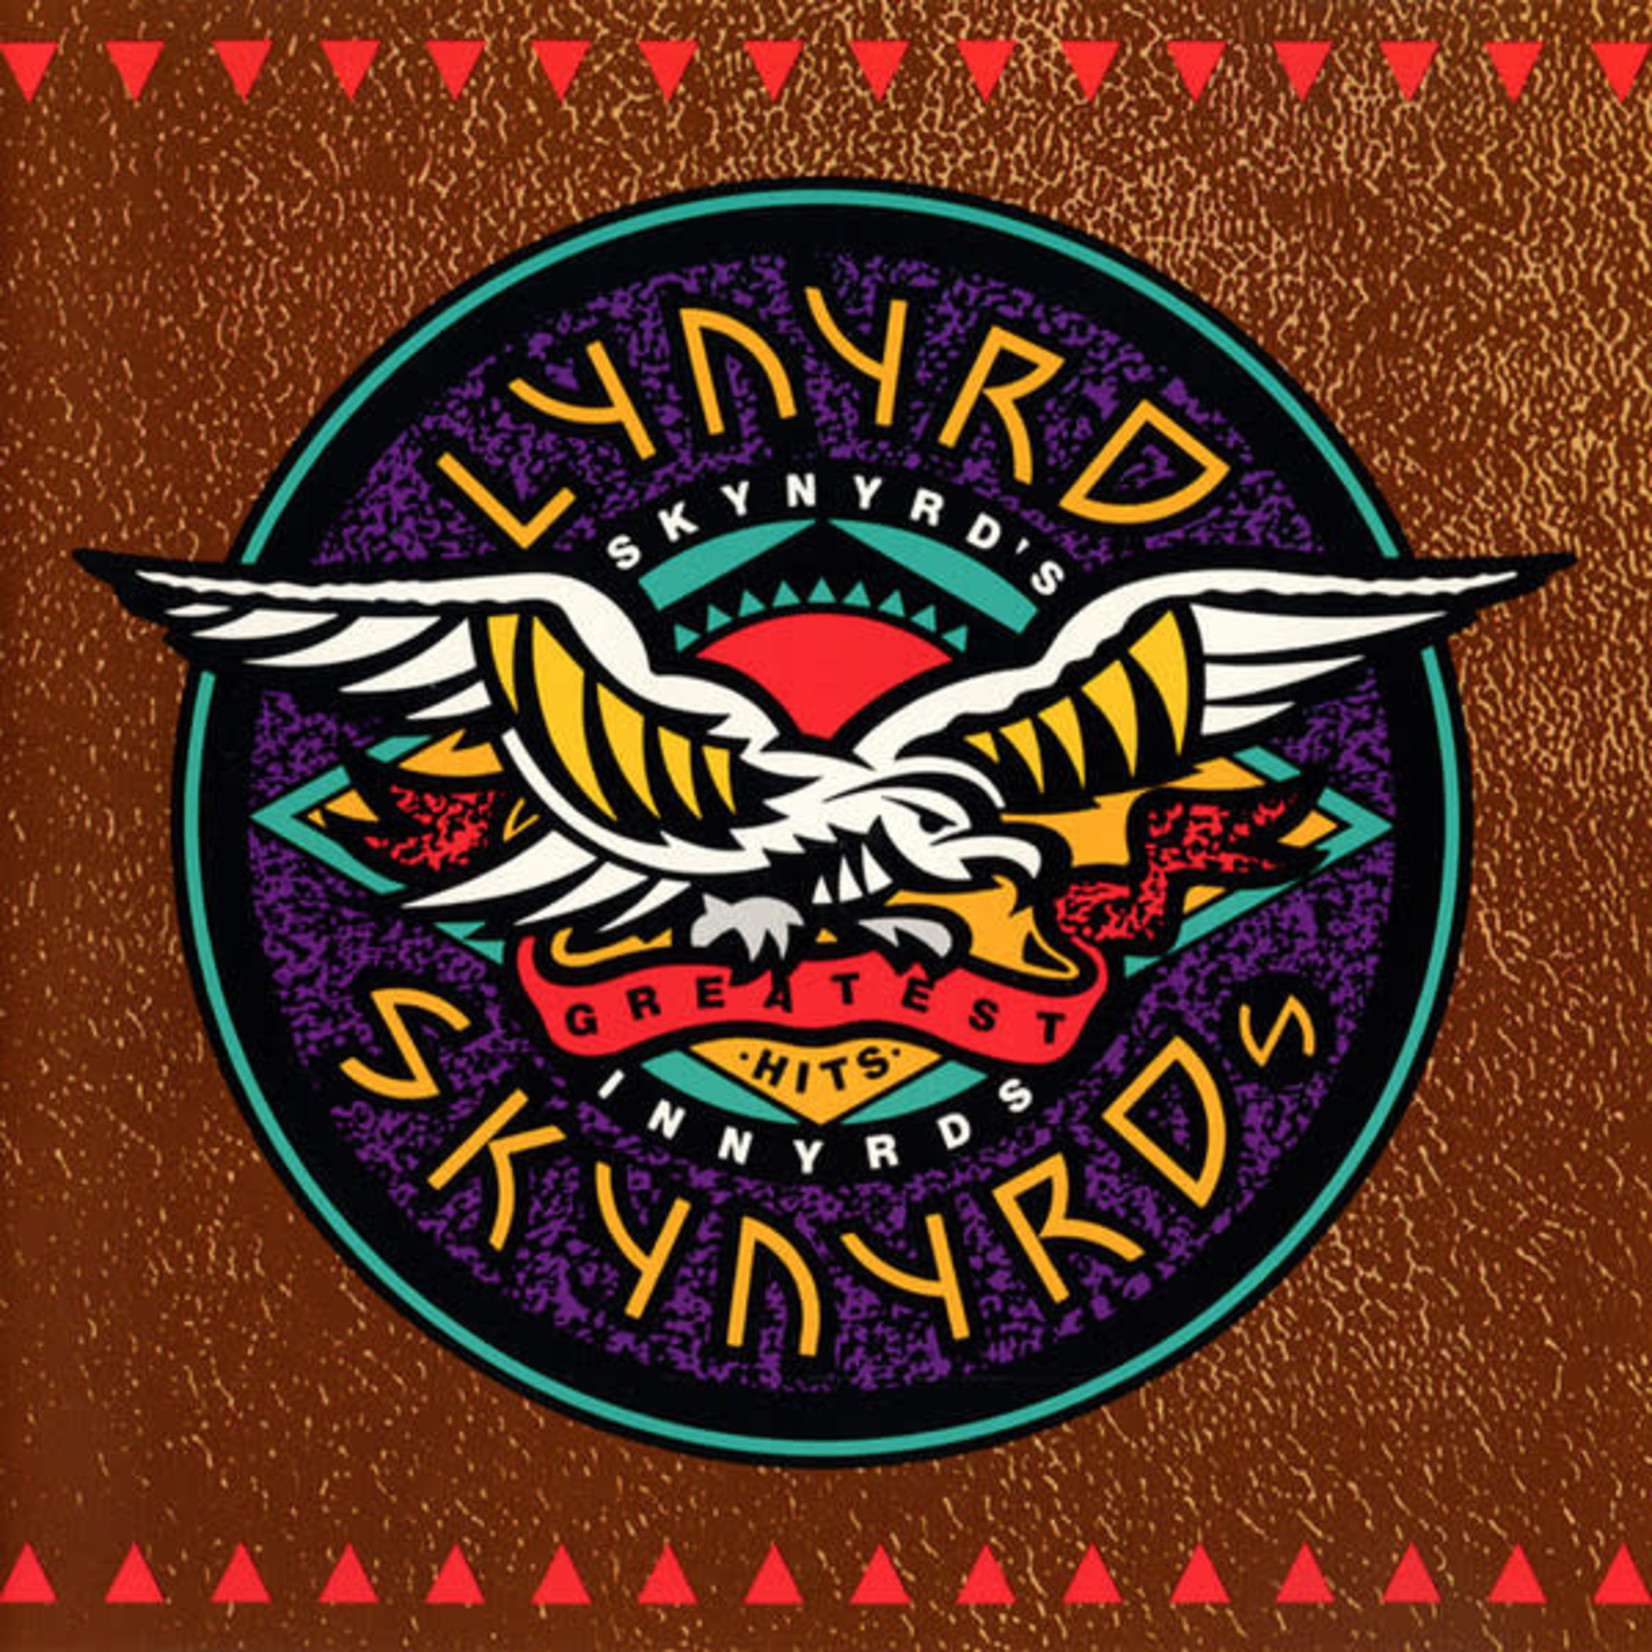 Monostereo Lynyrd Skynyrd Skynyrd's Innyrds (Their Greatest Hits)